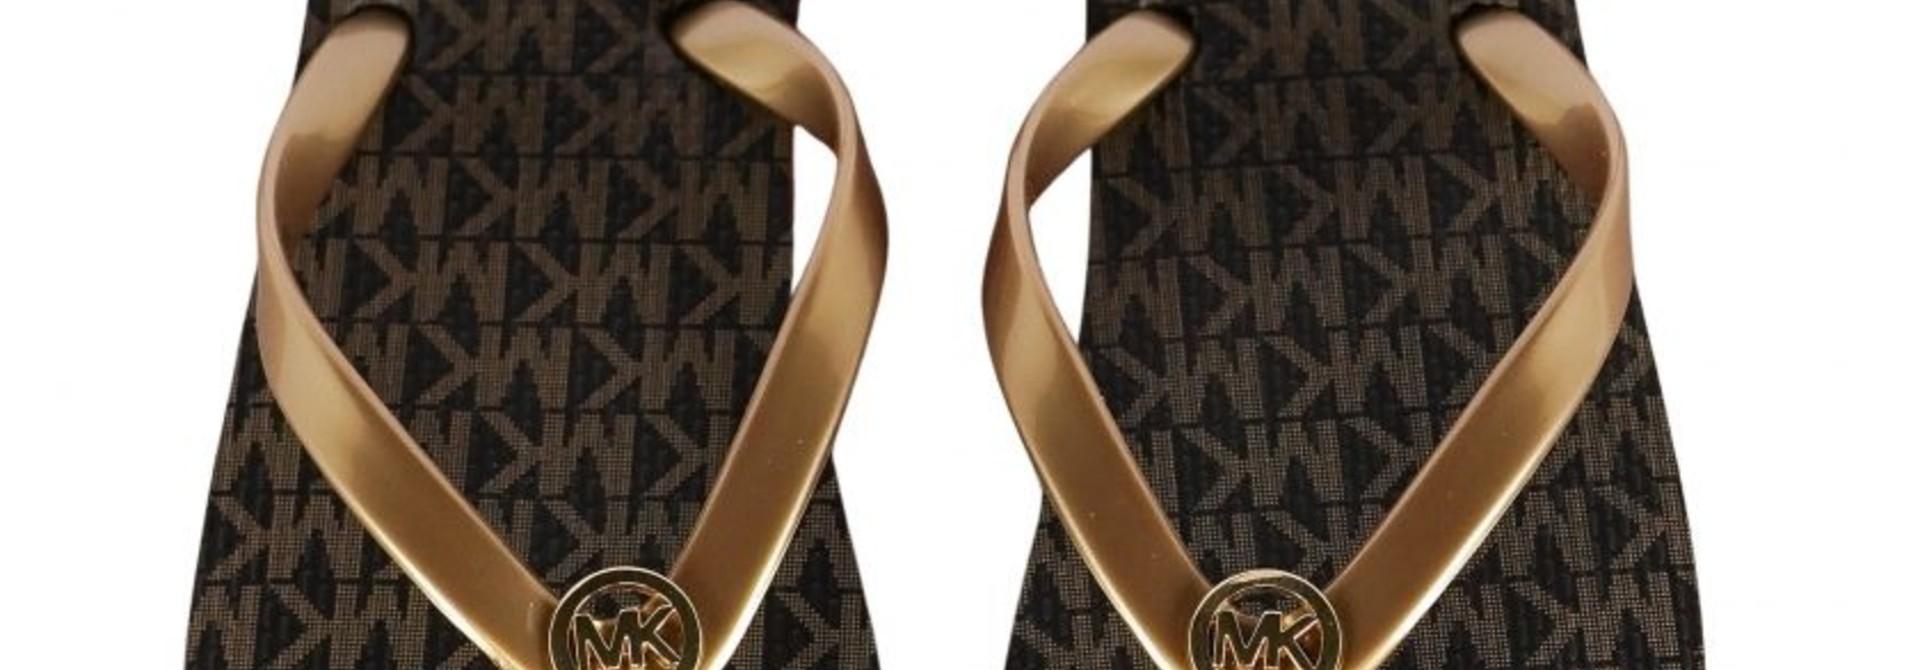 Michael Kors MK flip flop Stripe Eva  Brown